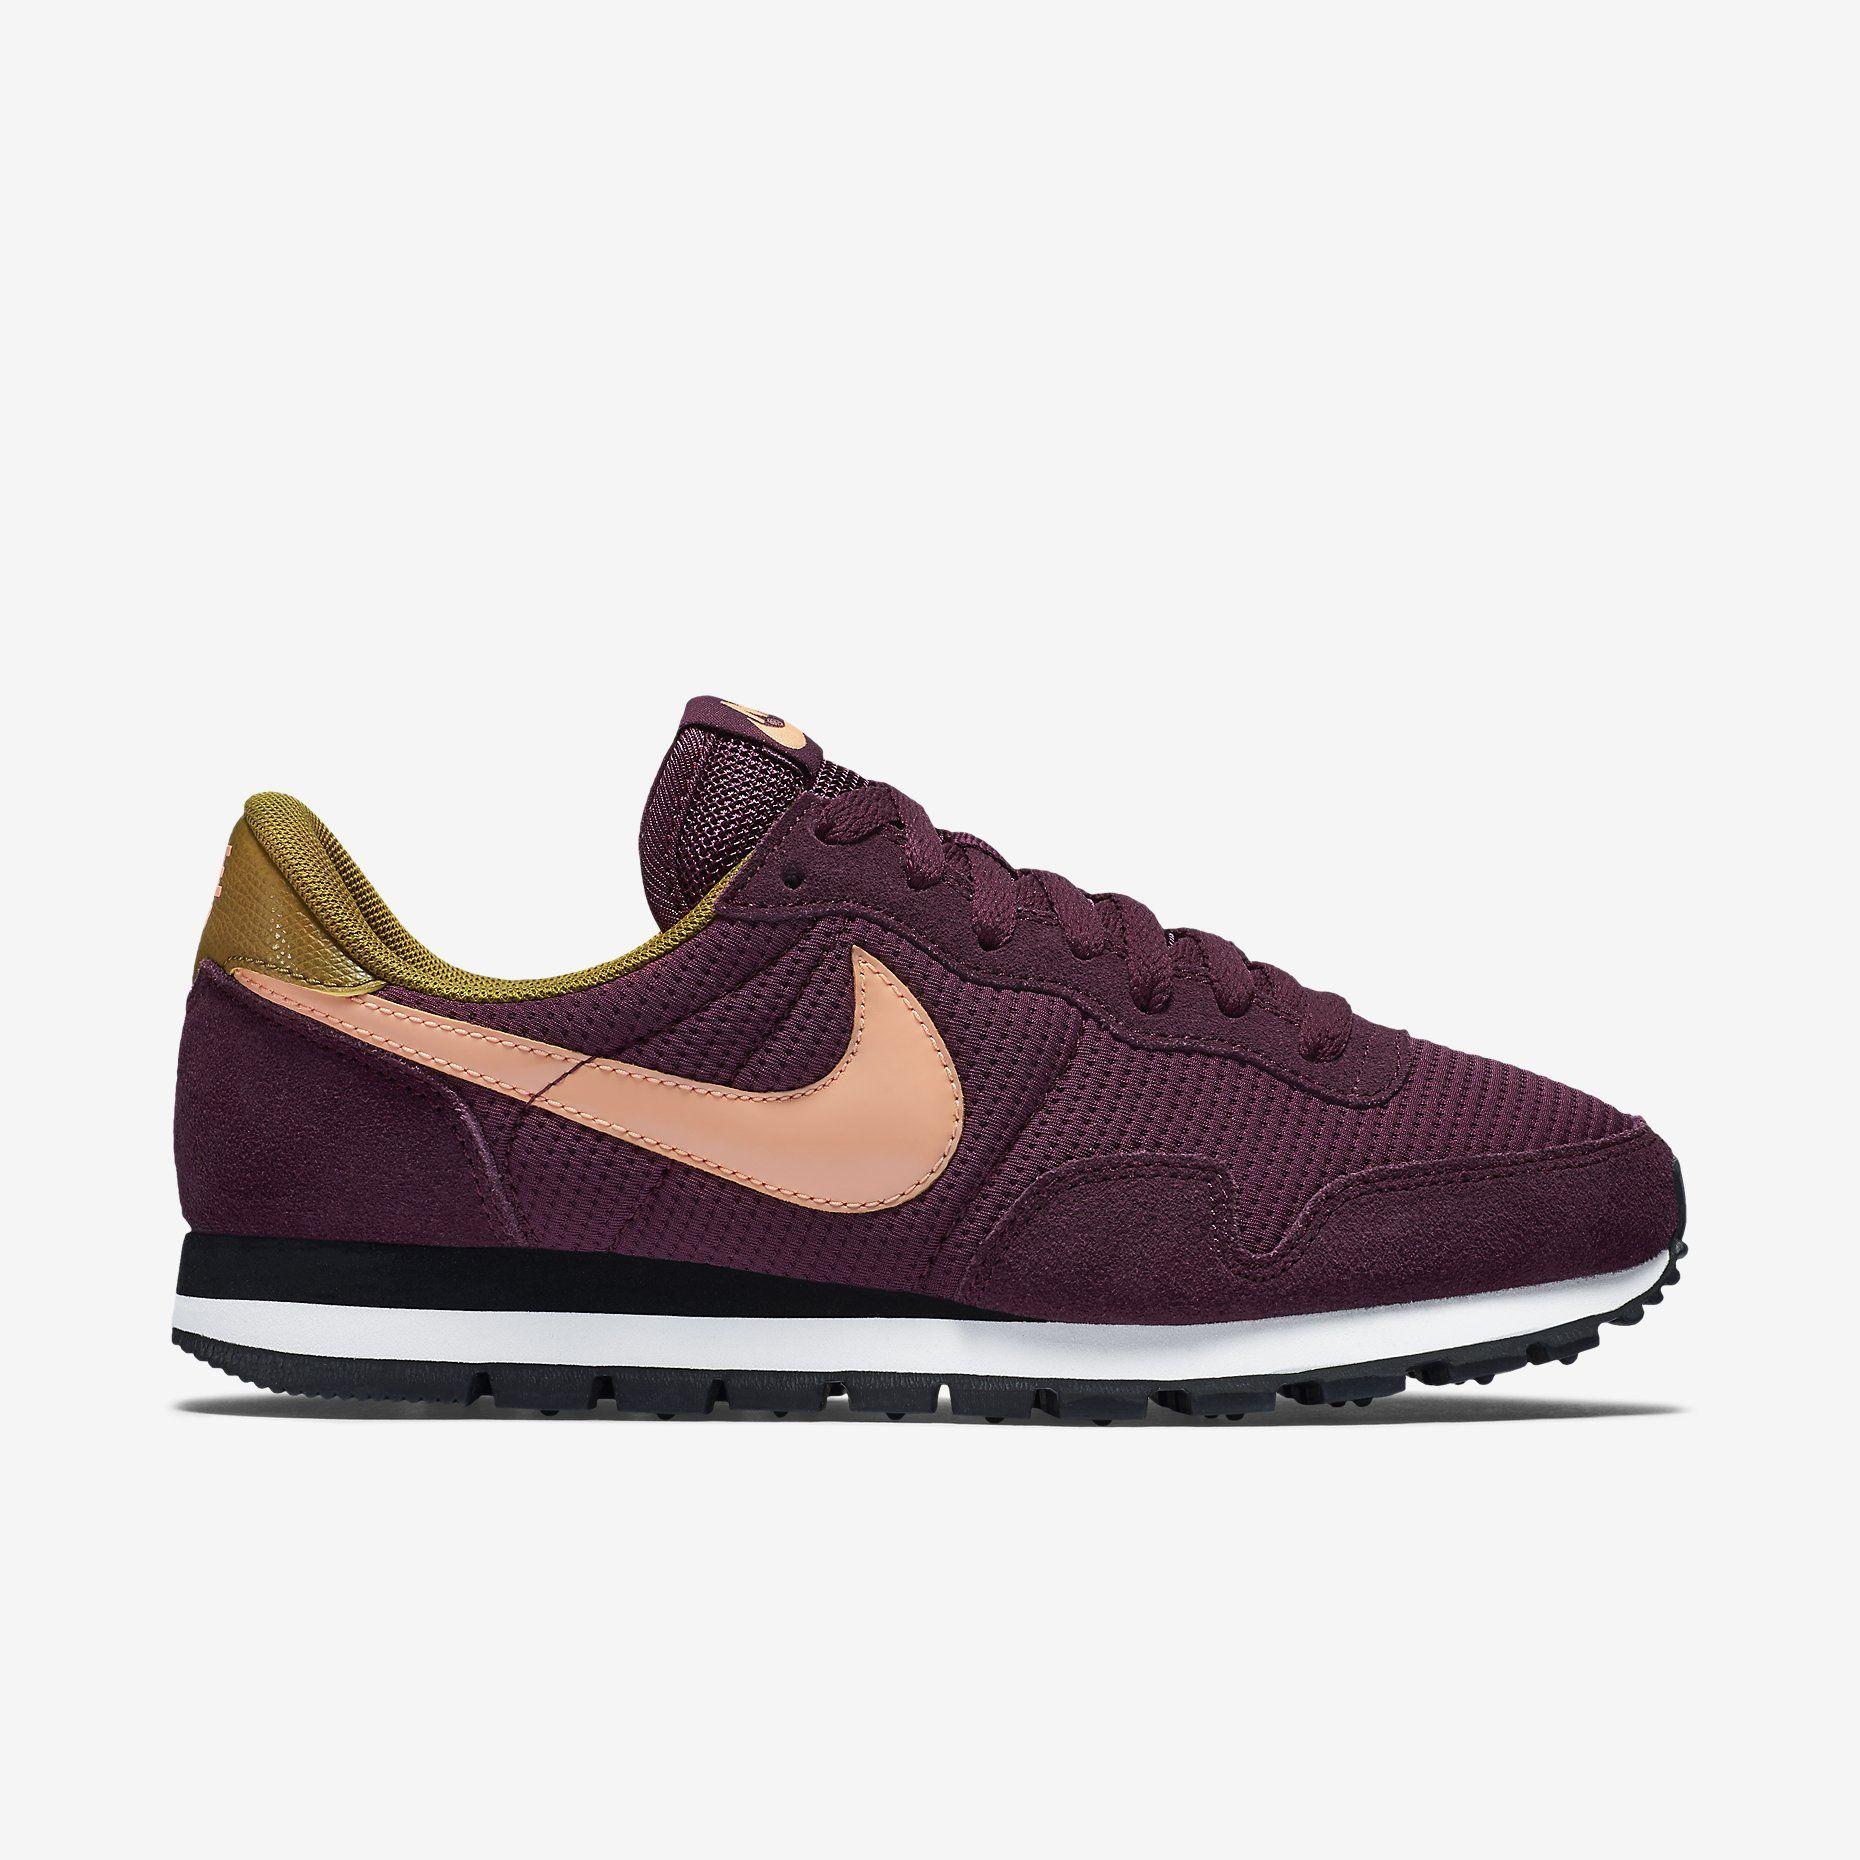 a6d1dde5d546 Nike Air Pegasus 83 Women s Shoe. Nike Store